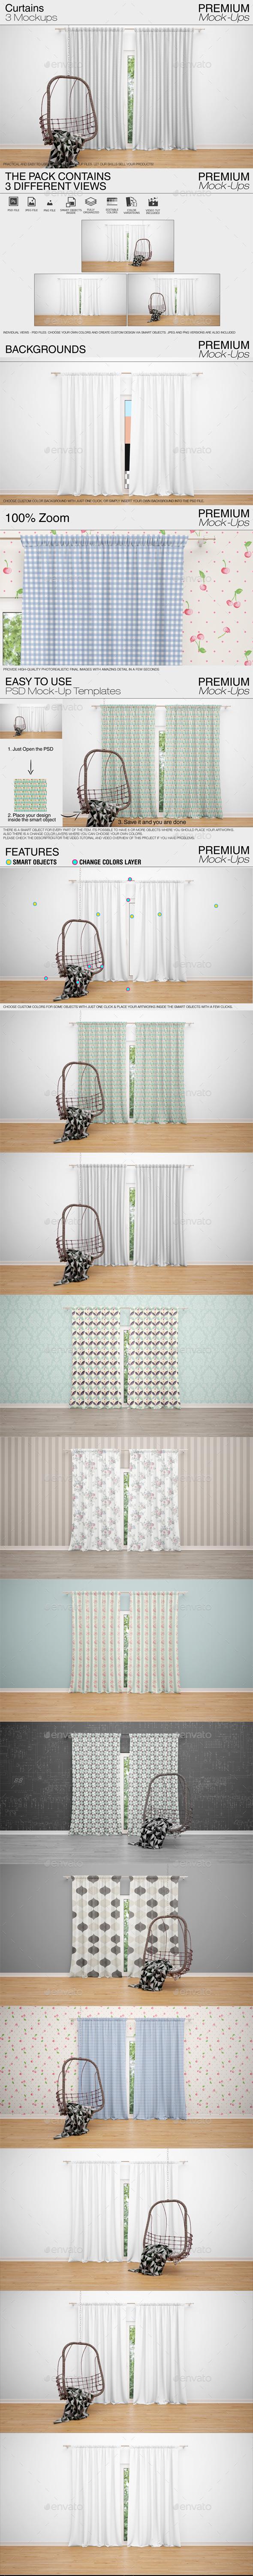 Curtains Mockup Pack - Print Product Mock-Ups